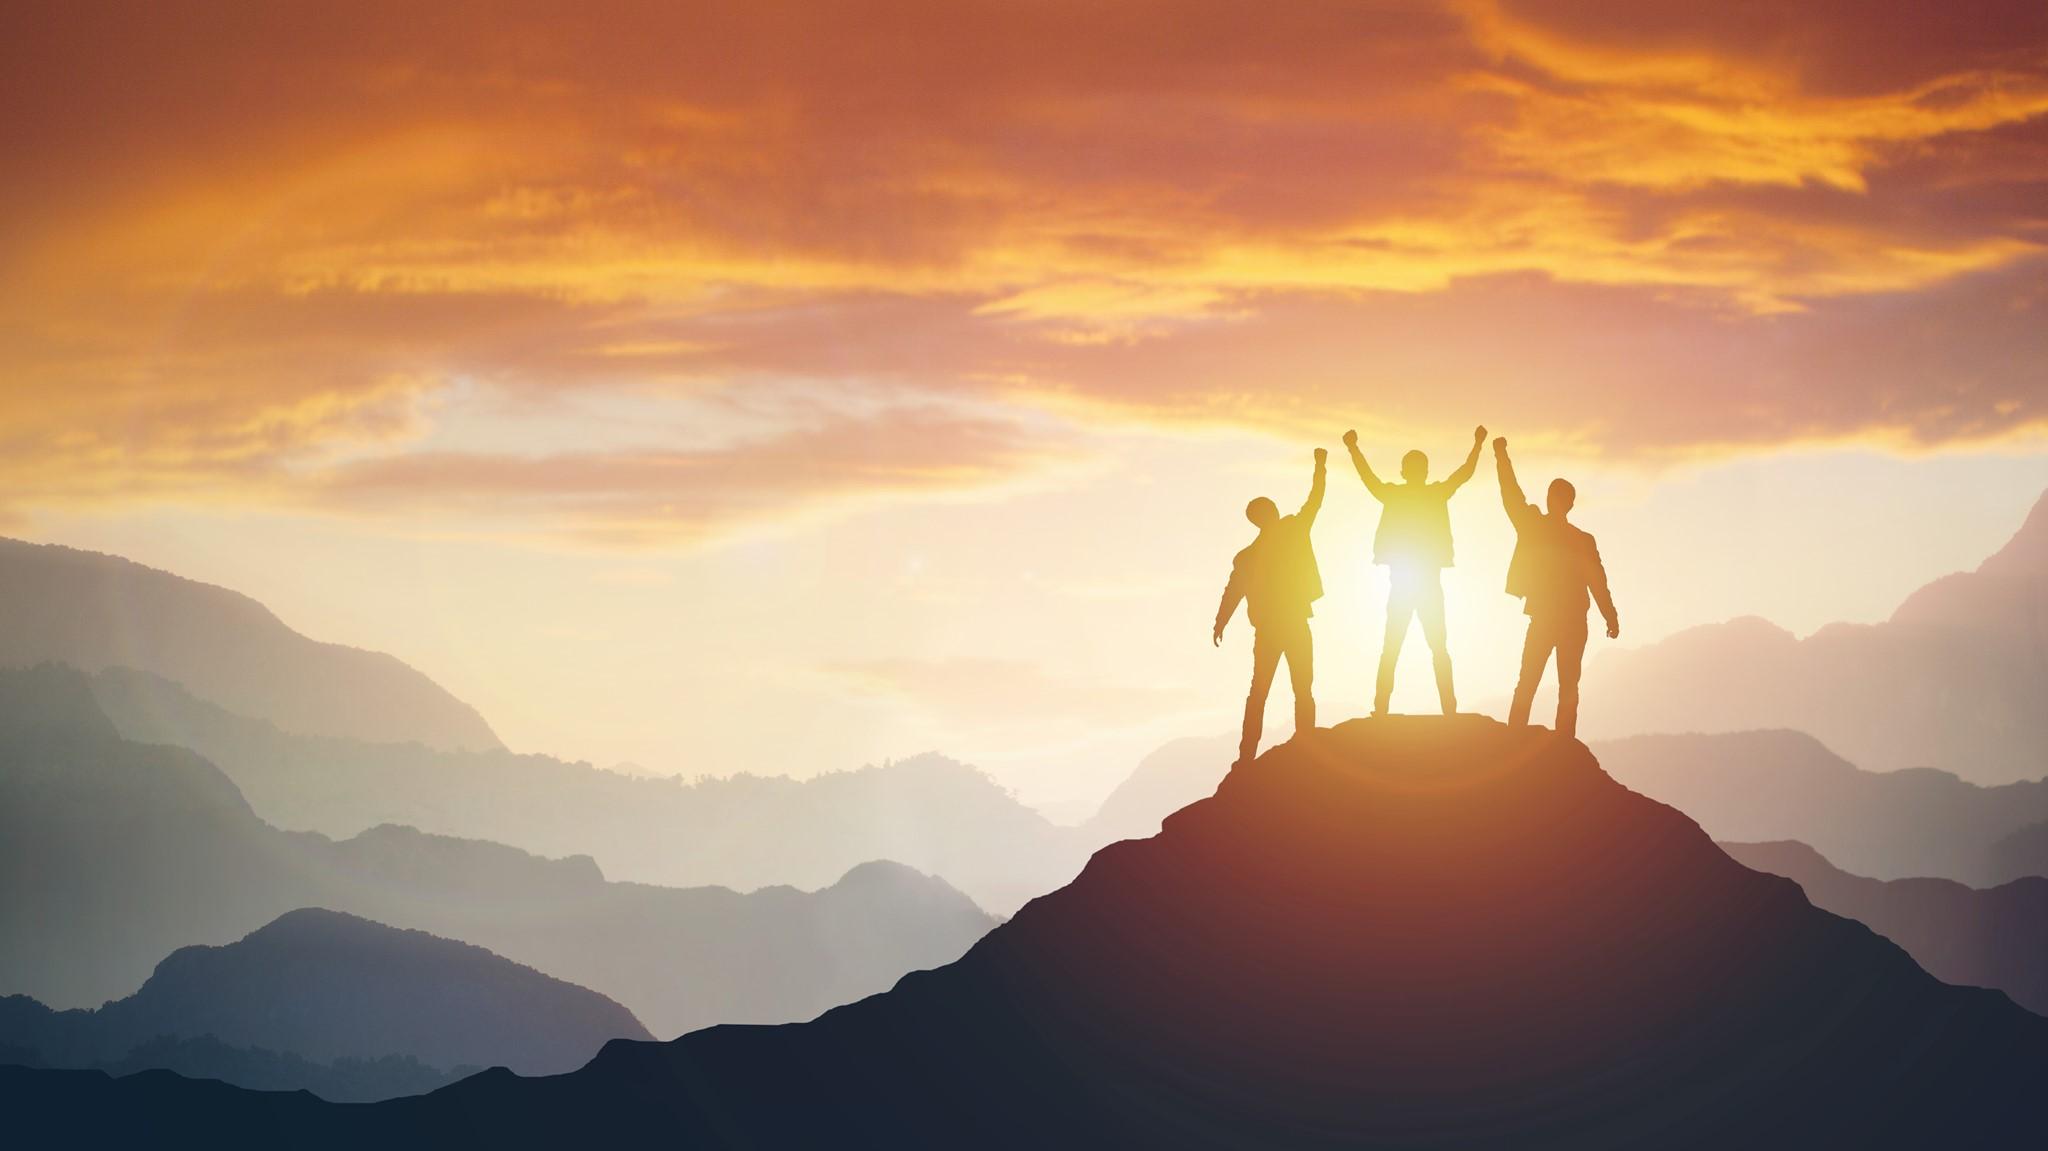 Todos somos líderes, por Inés Temple